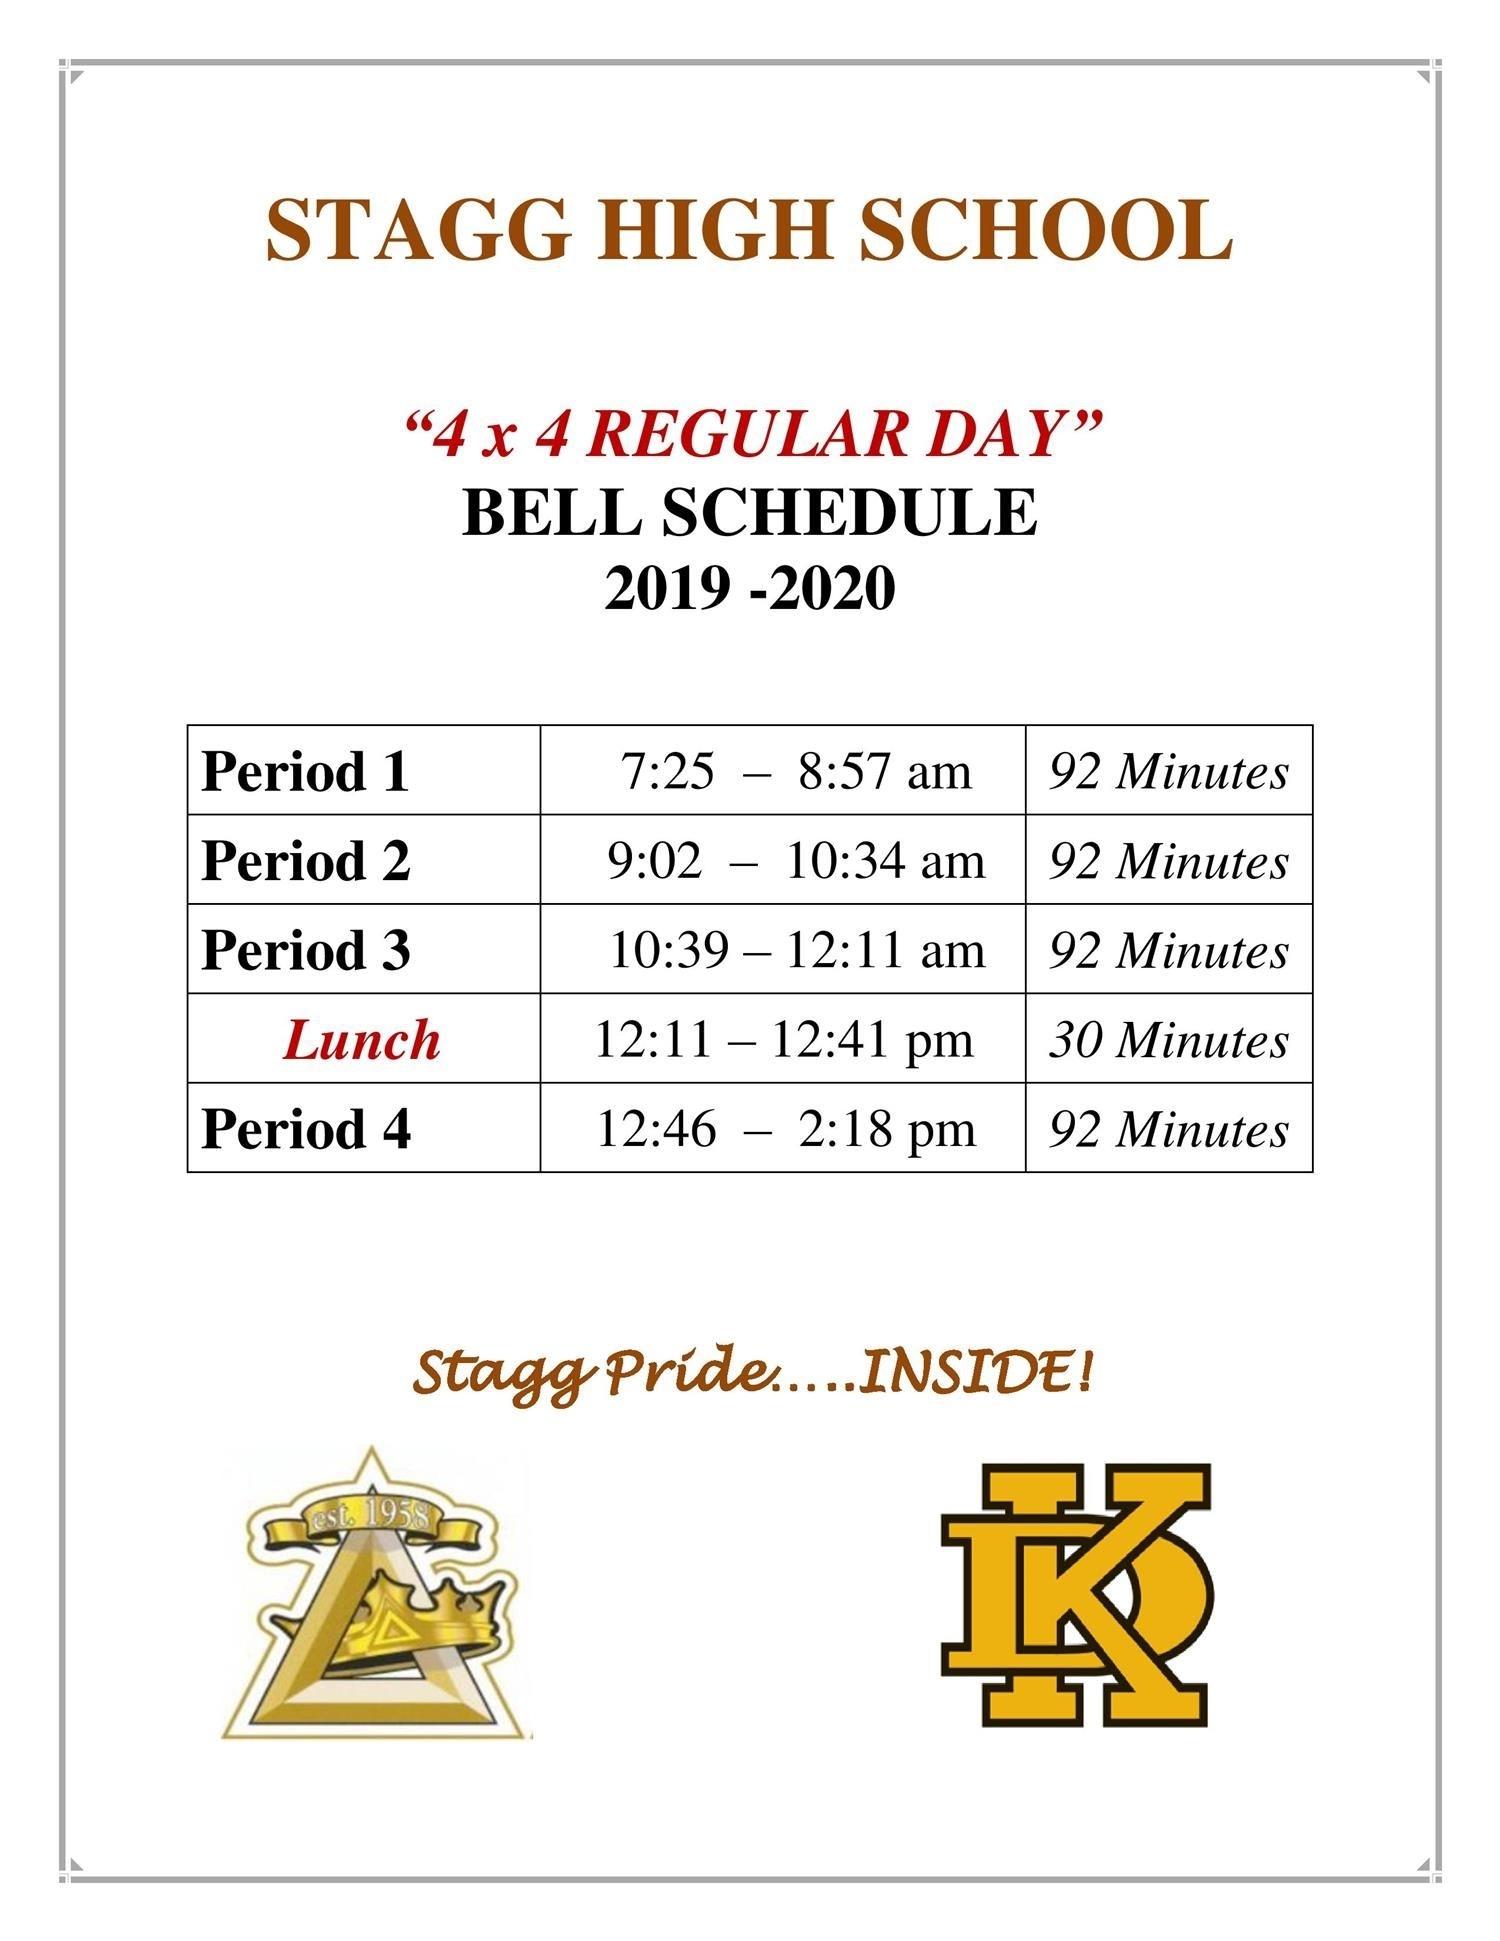 General Information / Bell Schedule